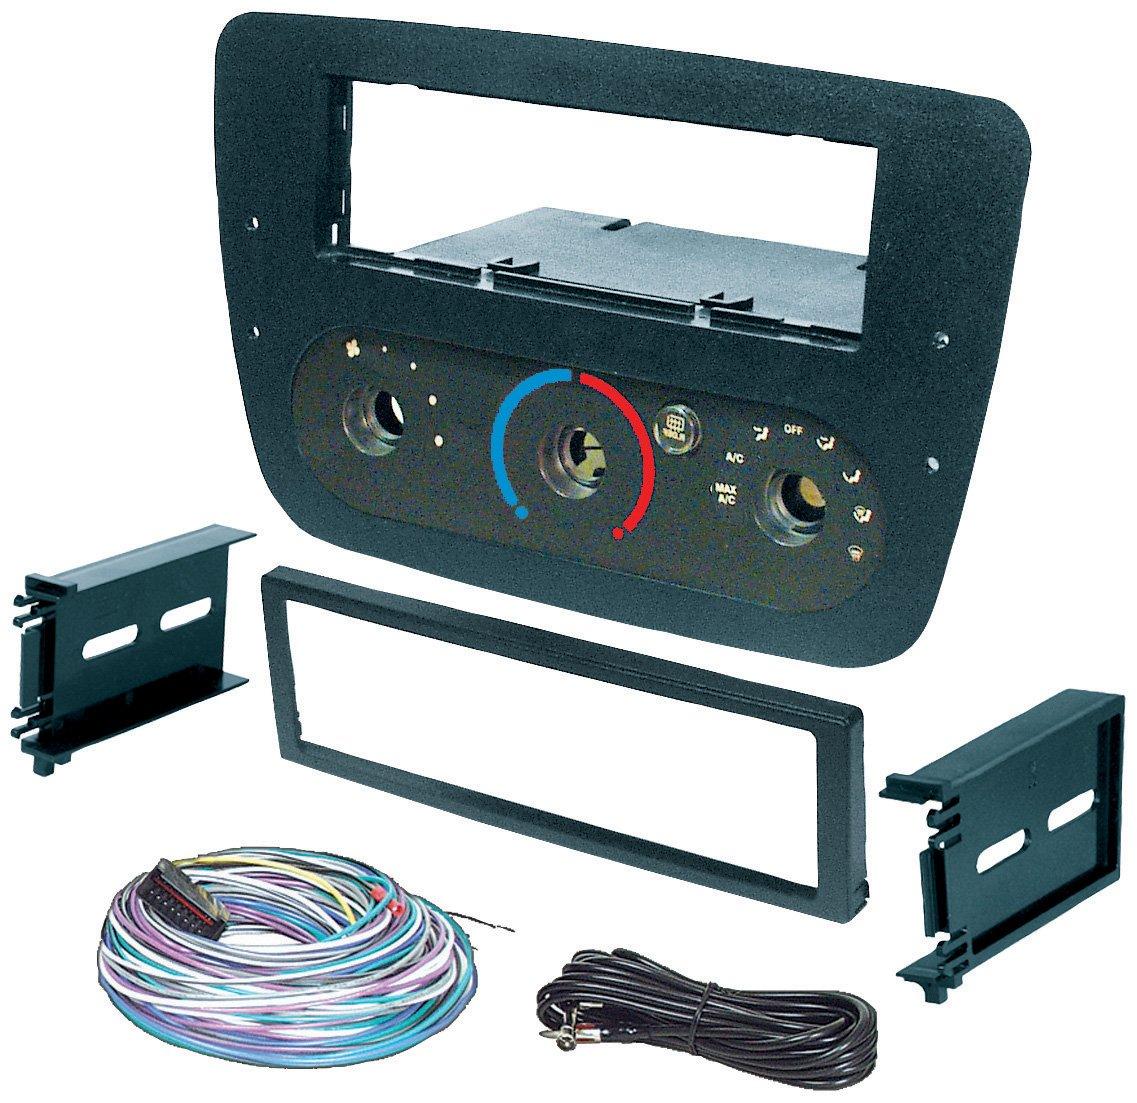 Amazon.com: AMERICAN INTERNATIONAL FMK578 Amer Intl Install Kit &: American  International: Home Audio & Theater